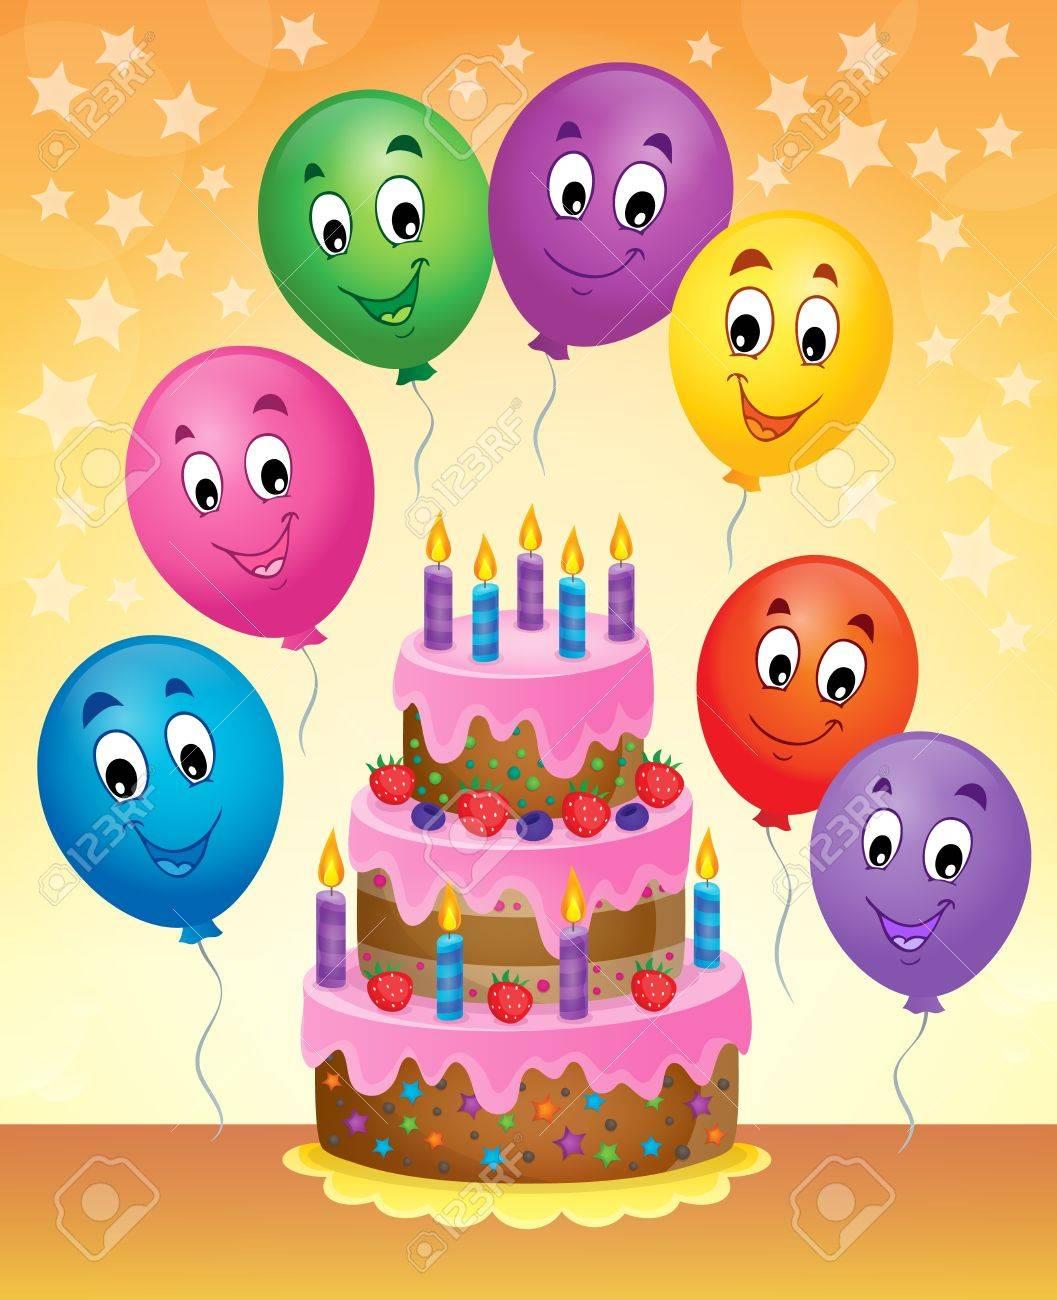 Stupendous Birthday Cake Theme Image 8 Vector Illustration Royalty Free Funny Birthday Cards Online Unhofree Goldxyz